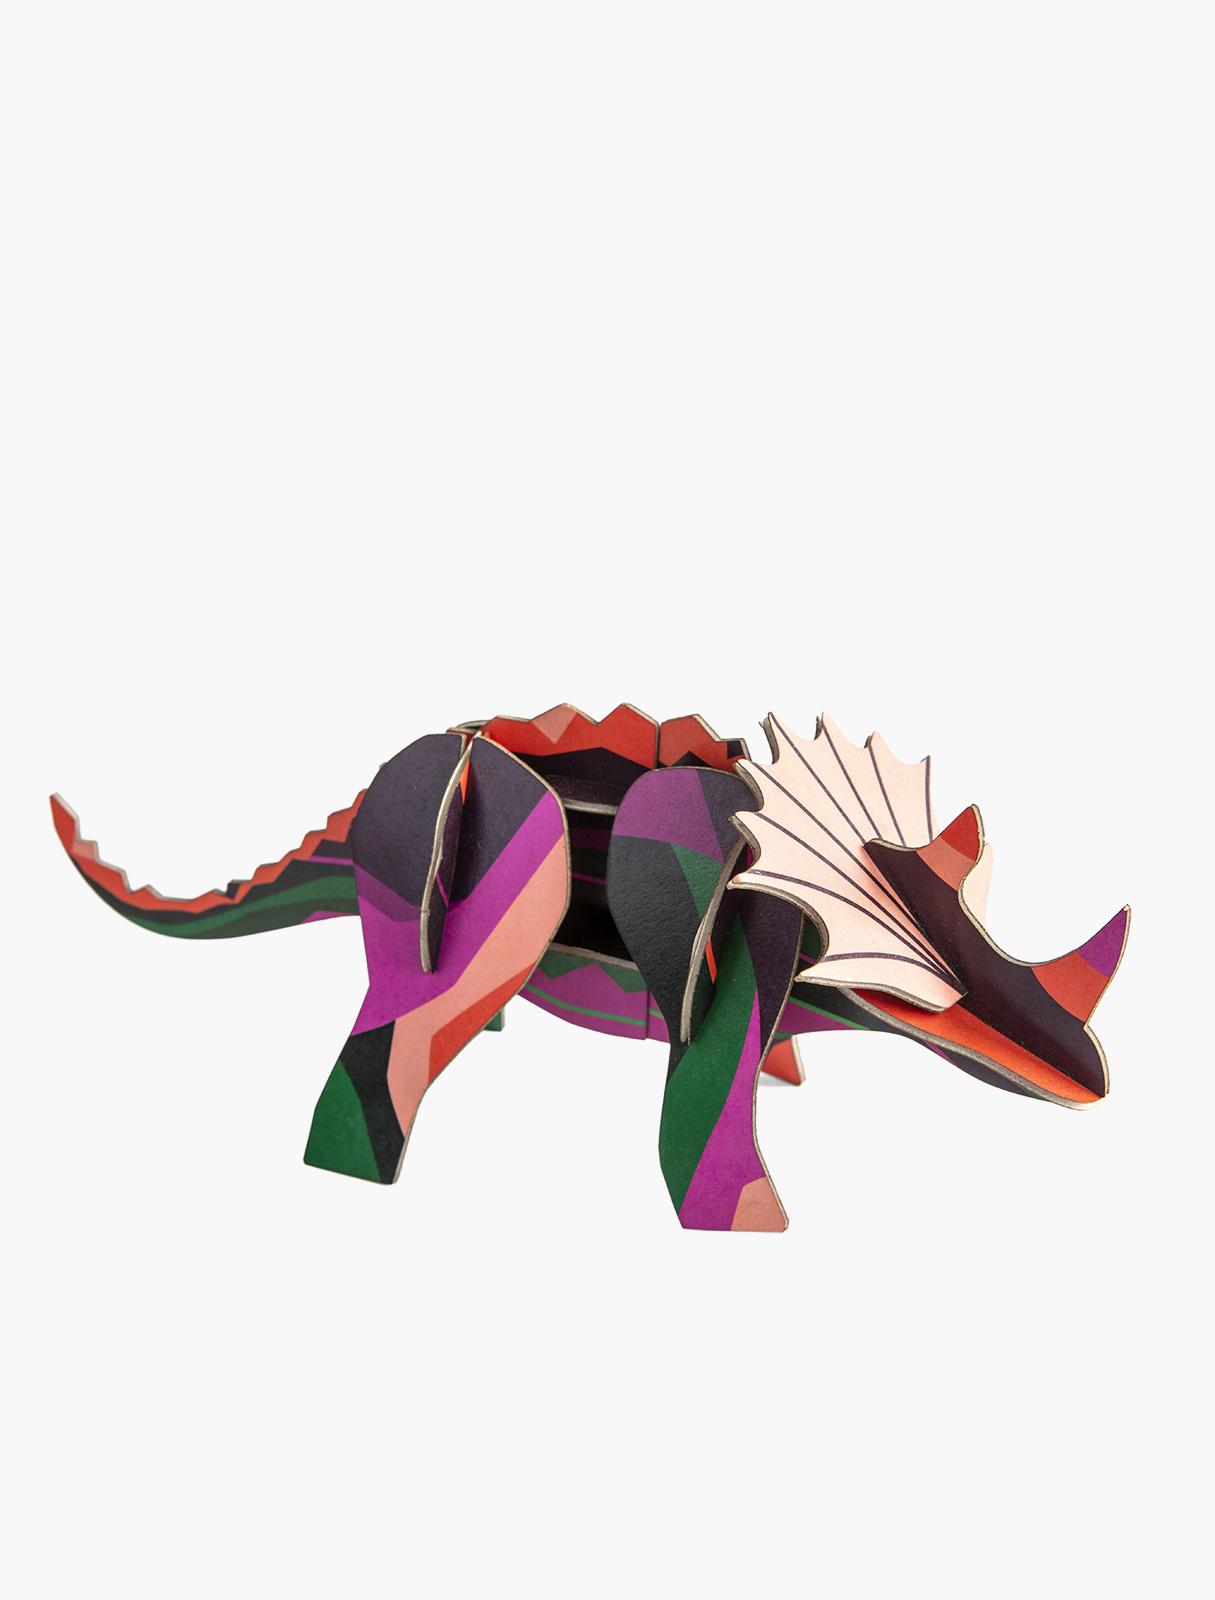 Studio Roof Baukasten Totem Triceratops